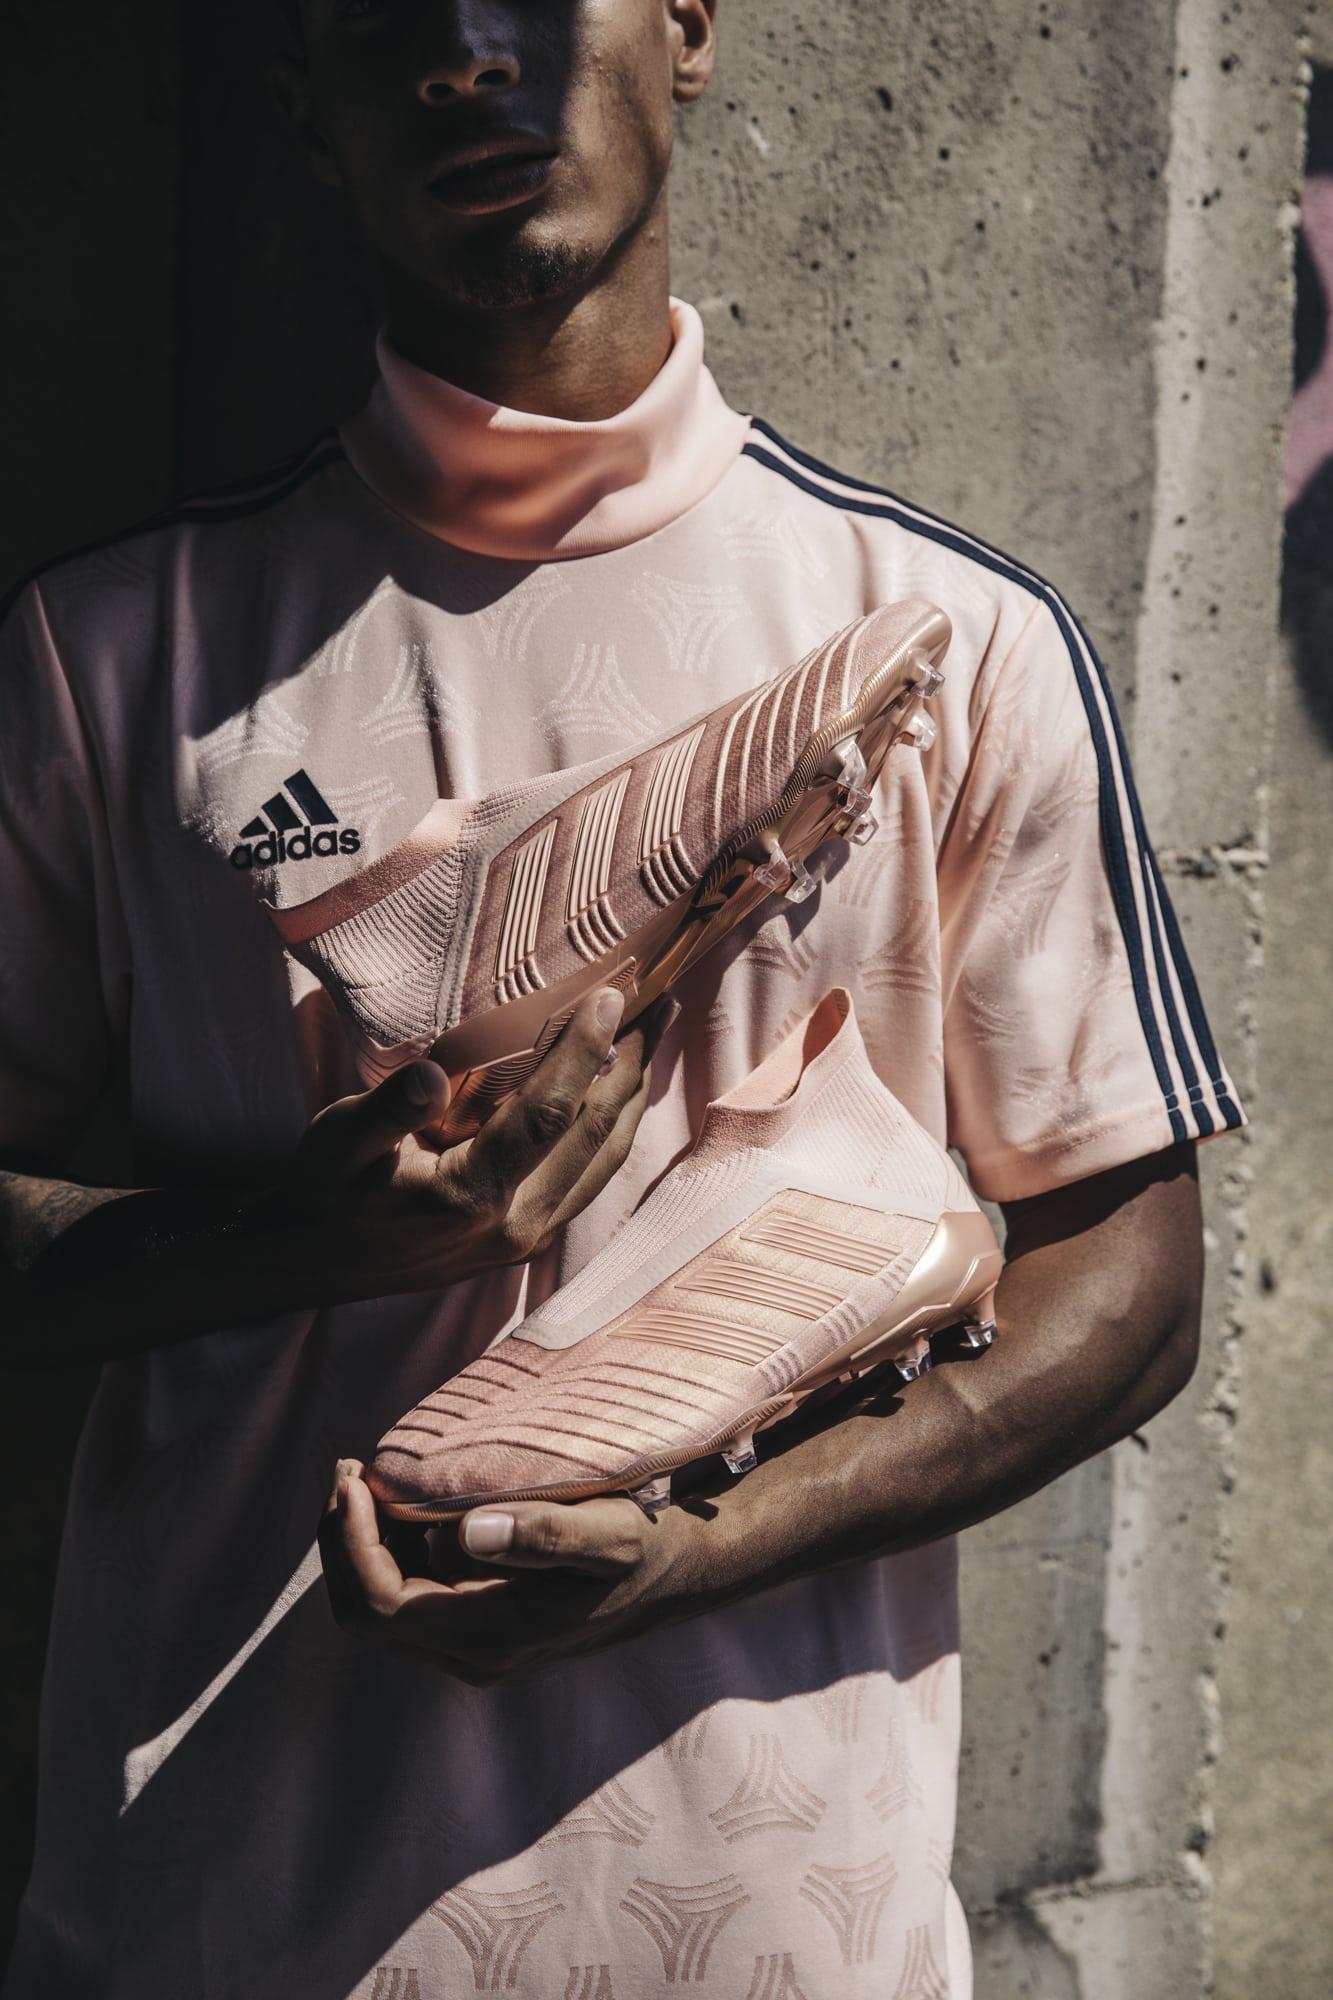 adidas-predator-spectral-mode-septembre-2018-5